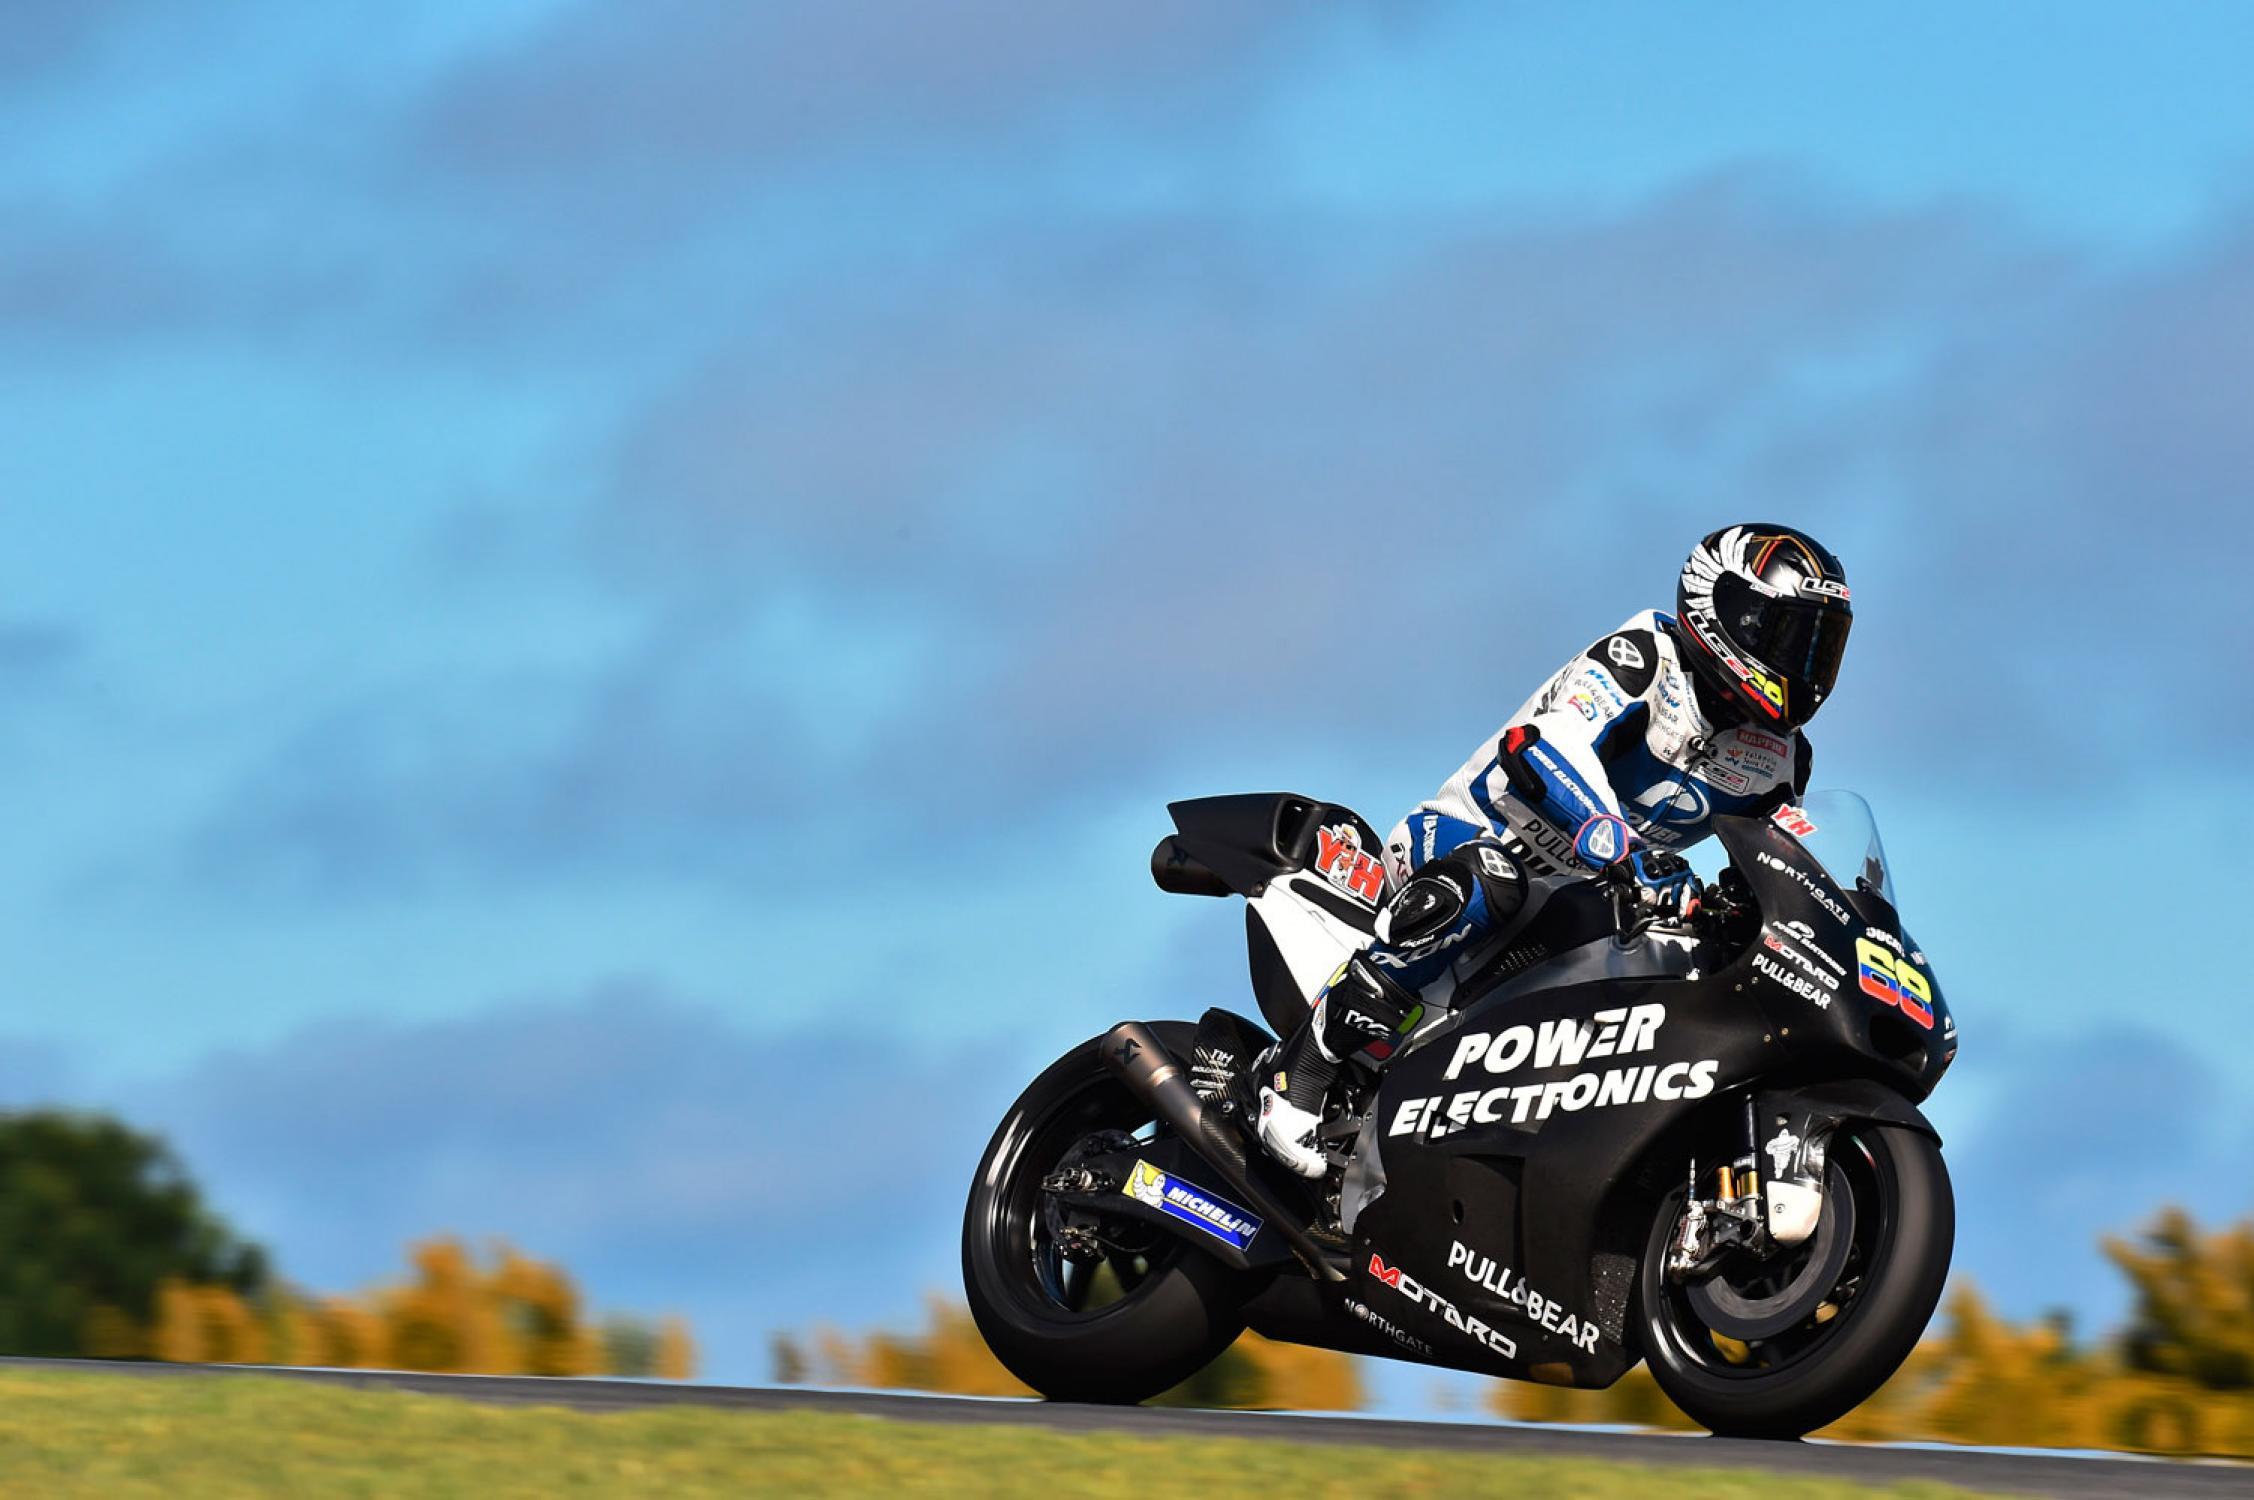 Test MotoGP Phillip Island 2016 68-hernandez_68-hernandez-05.gallery_full_top_fullscreen